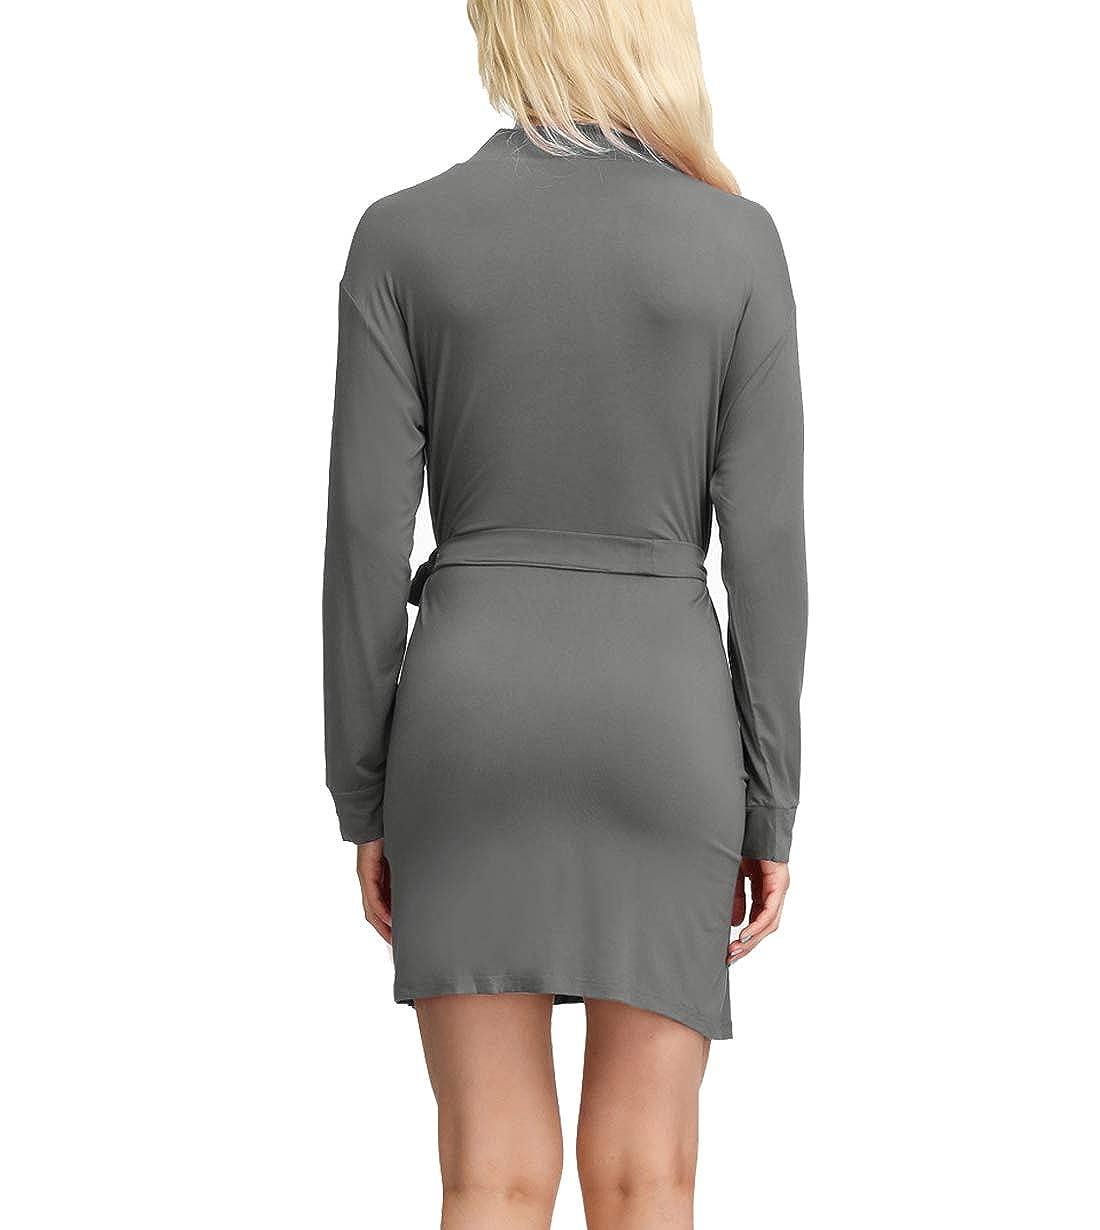 Womens Cotton Kimono Robes Lightweight Robe Short//Long Knit Bathrobe Soft Sleepwear Ladies Loungewear S-XXL